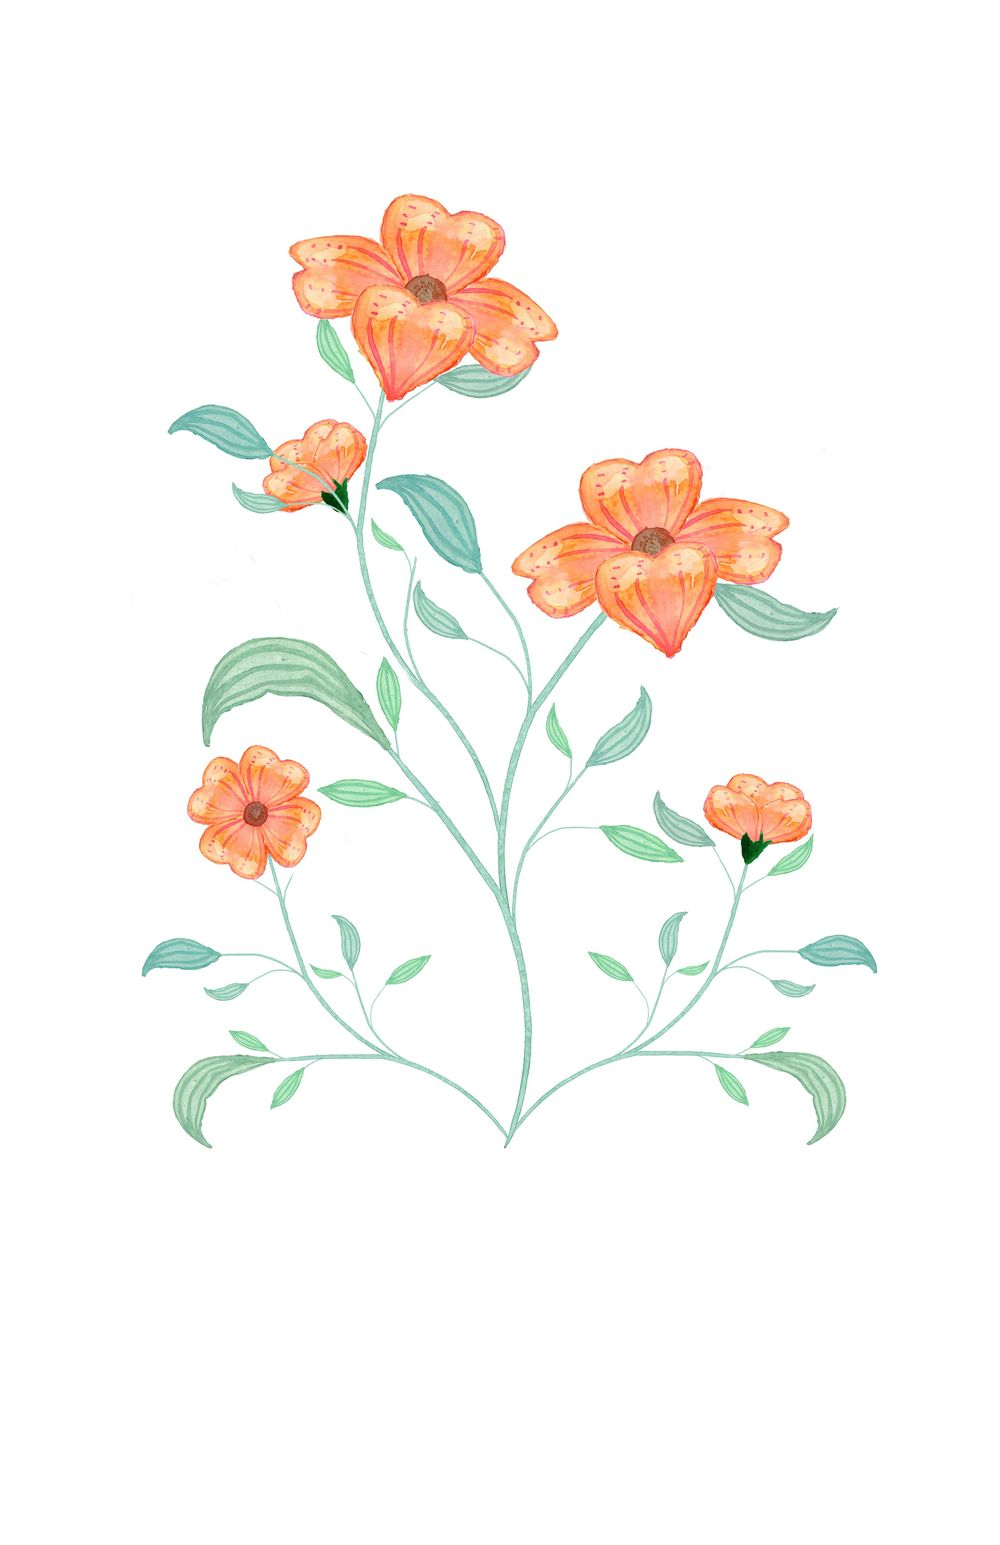 Botanical Scenes in Photoshop exercises - image 2 - student project